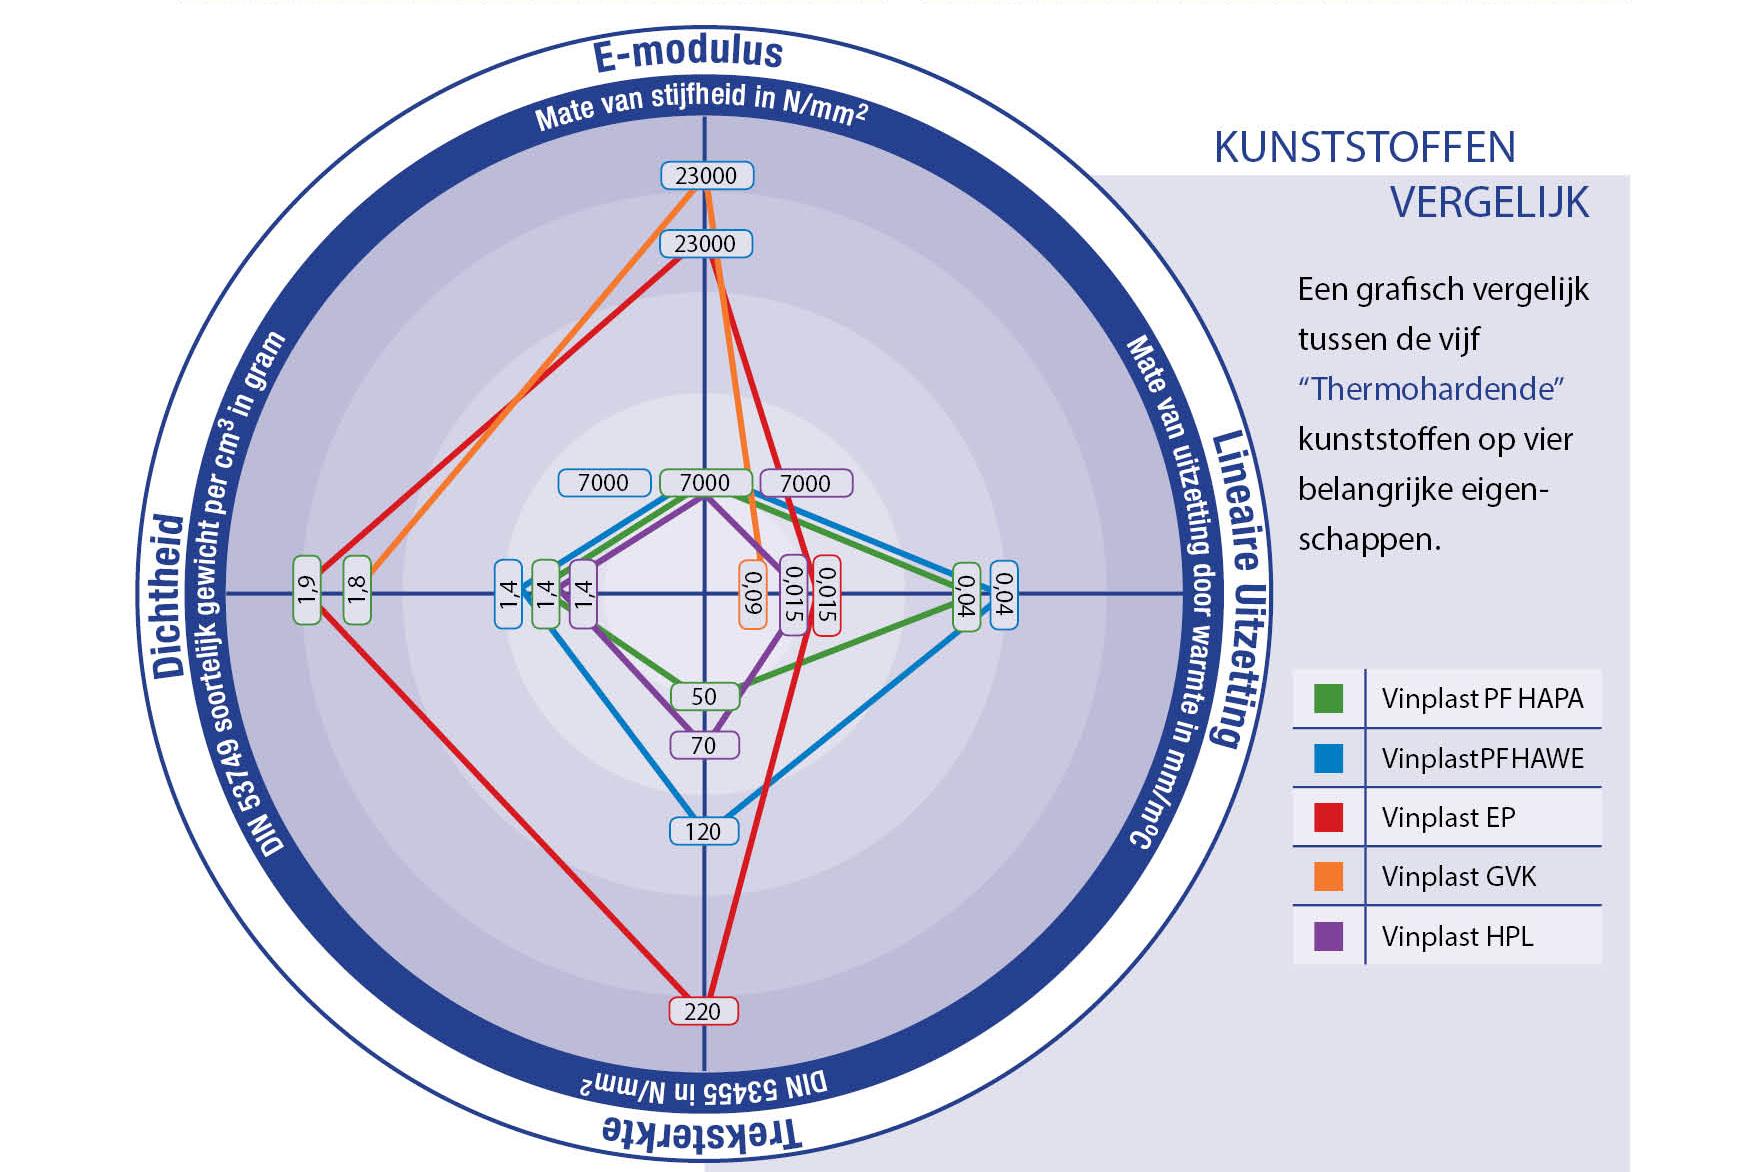 Vergelijking thermohardende kunststoffen